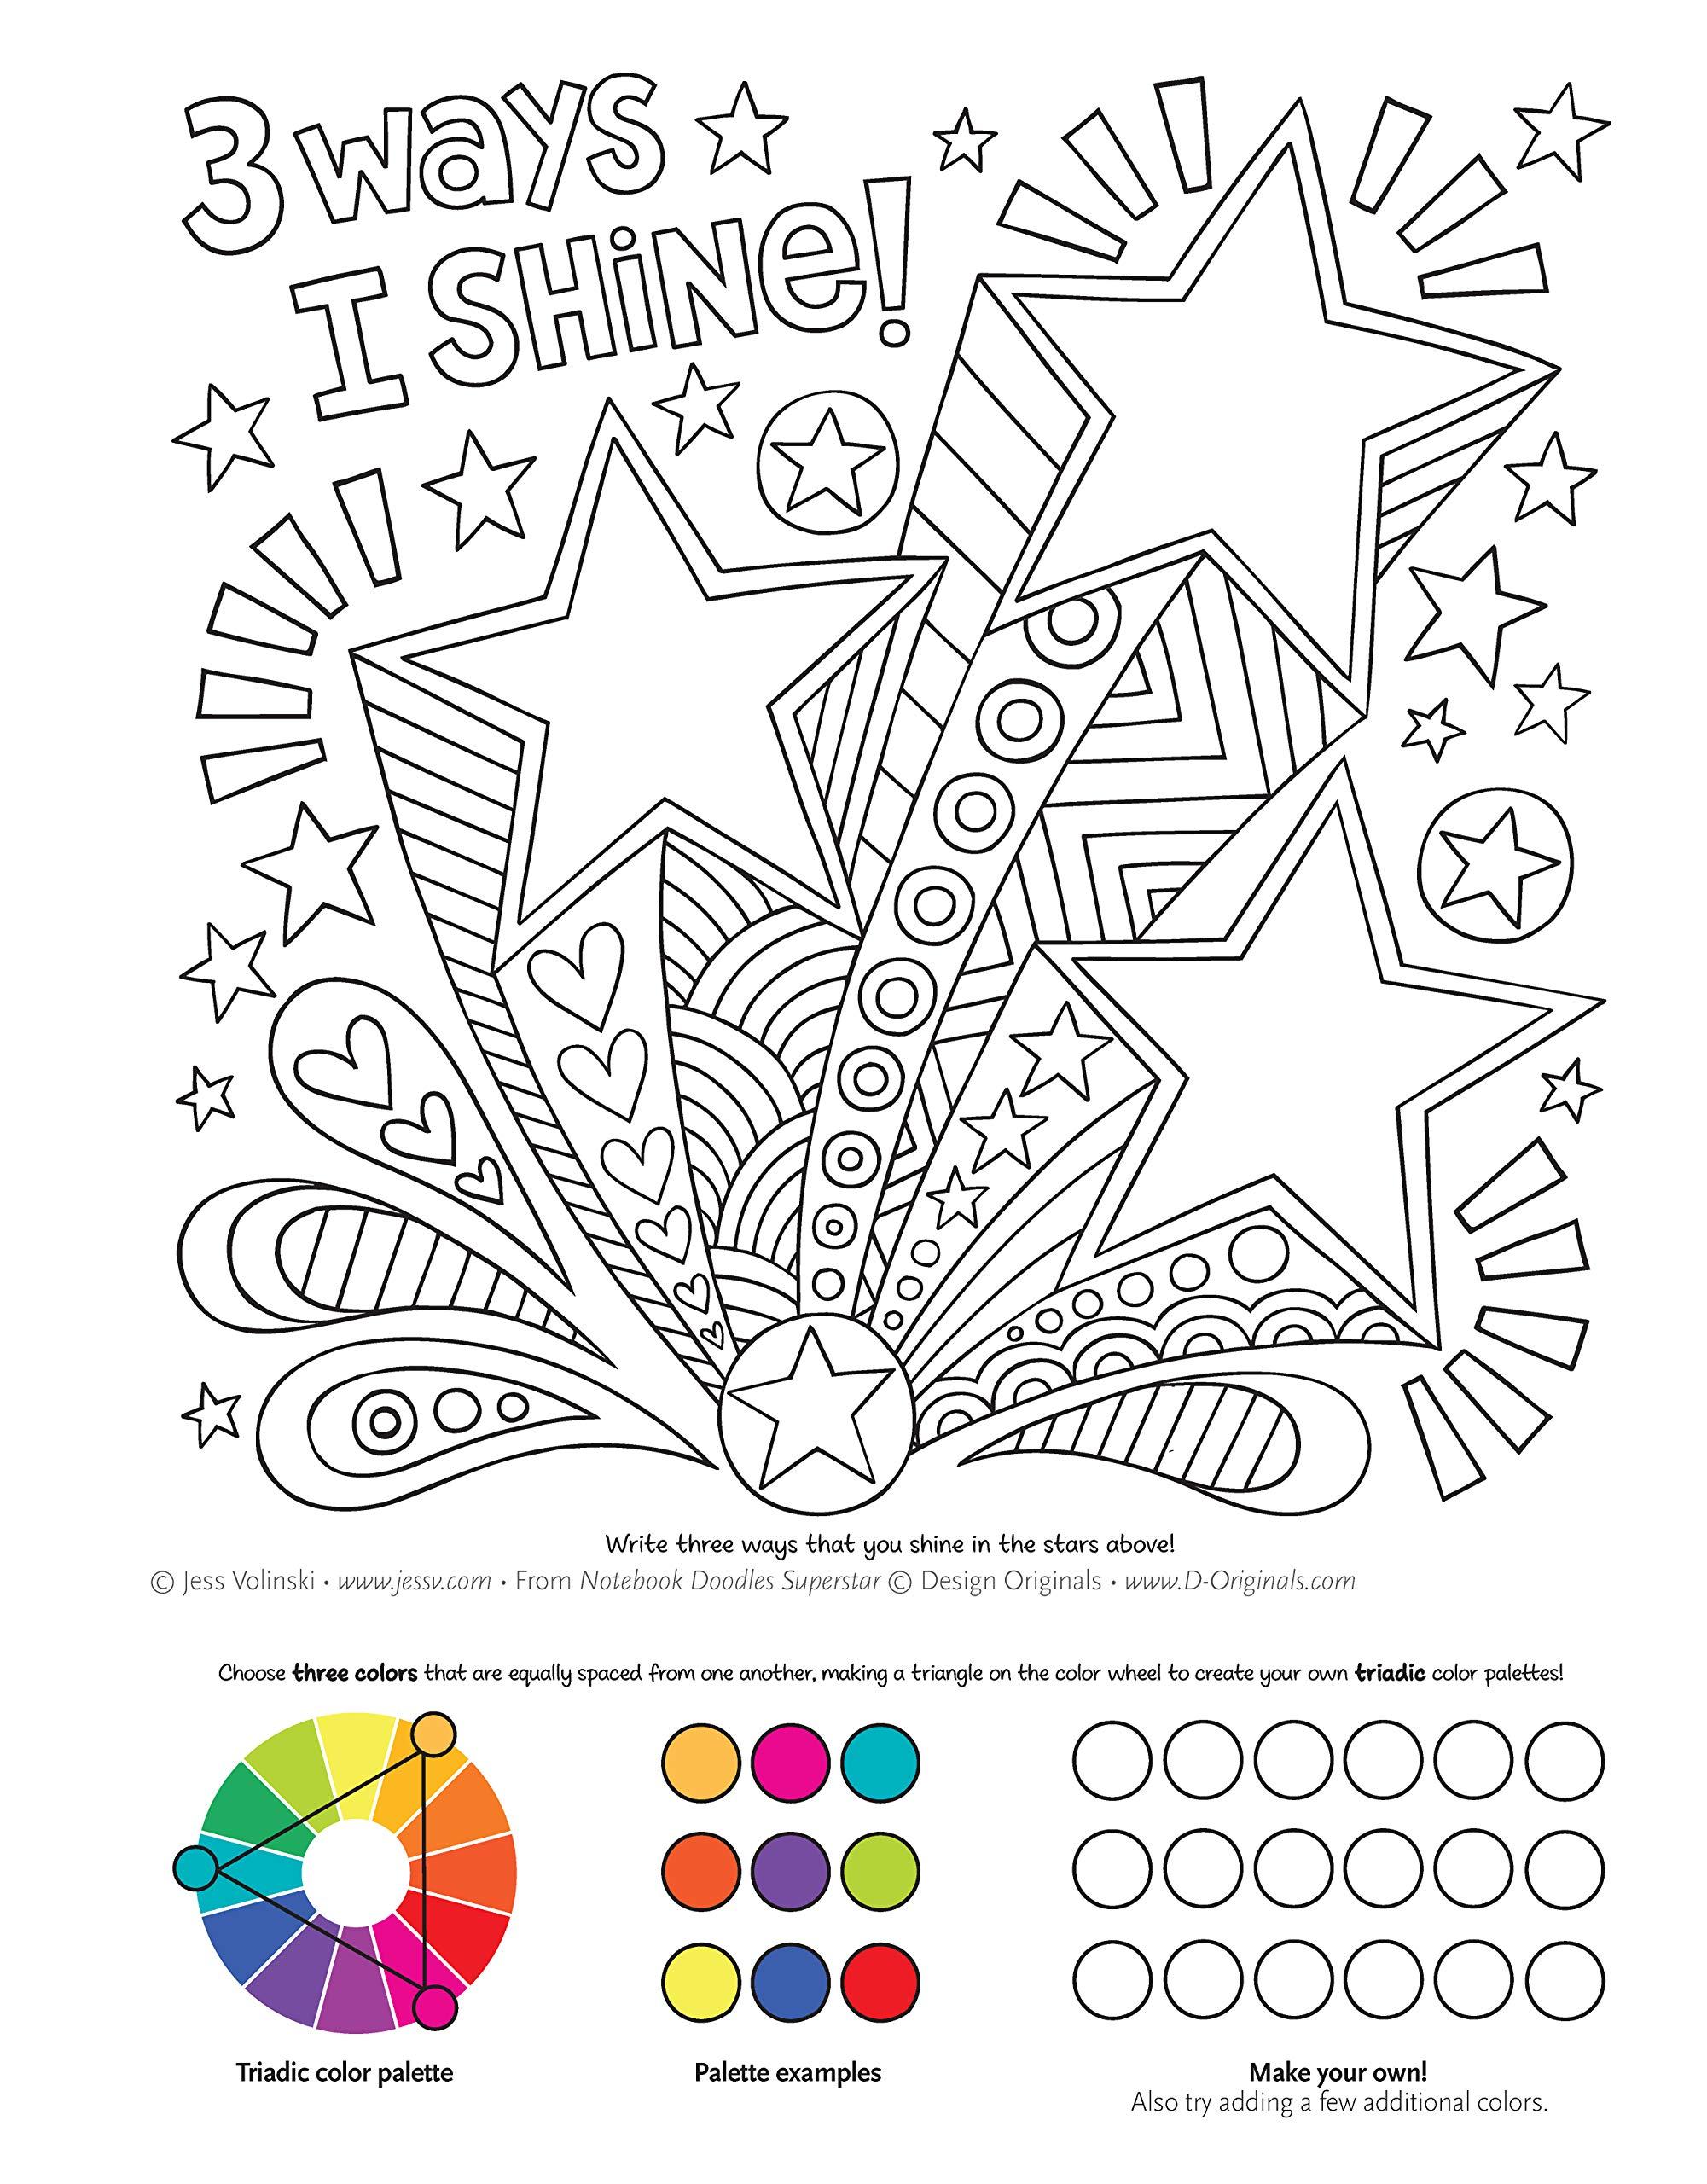 Notebook Doodles Superstar: Coloring & Activity Book: Amazon.de ...